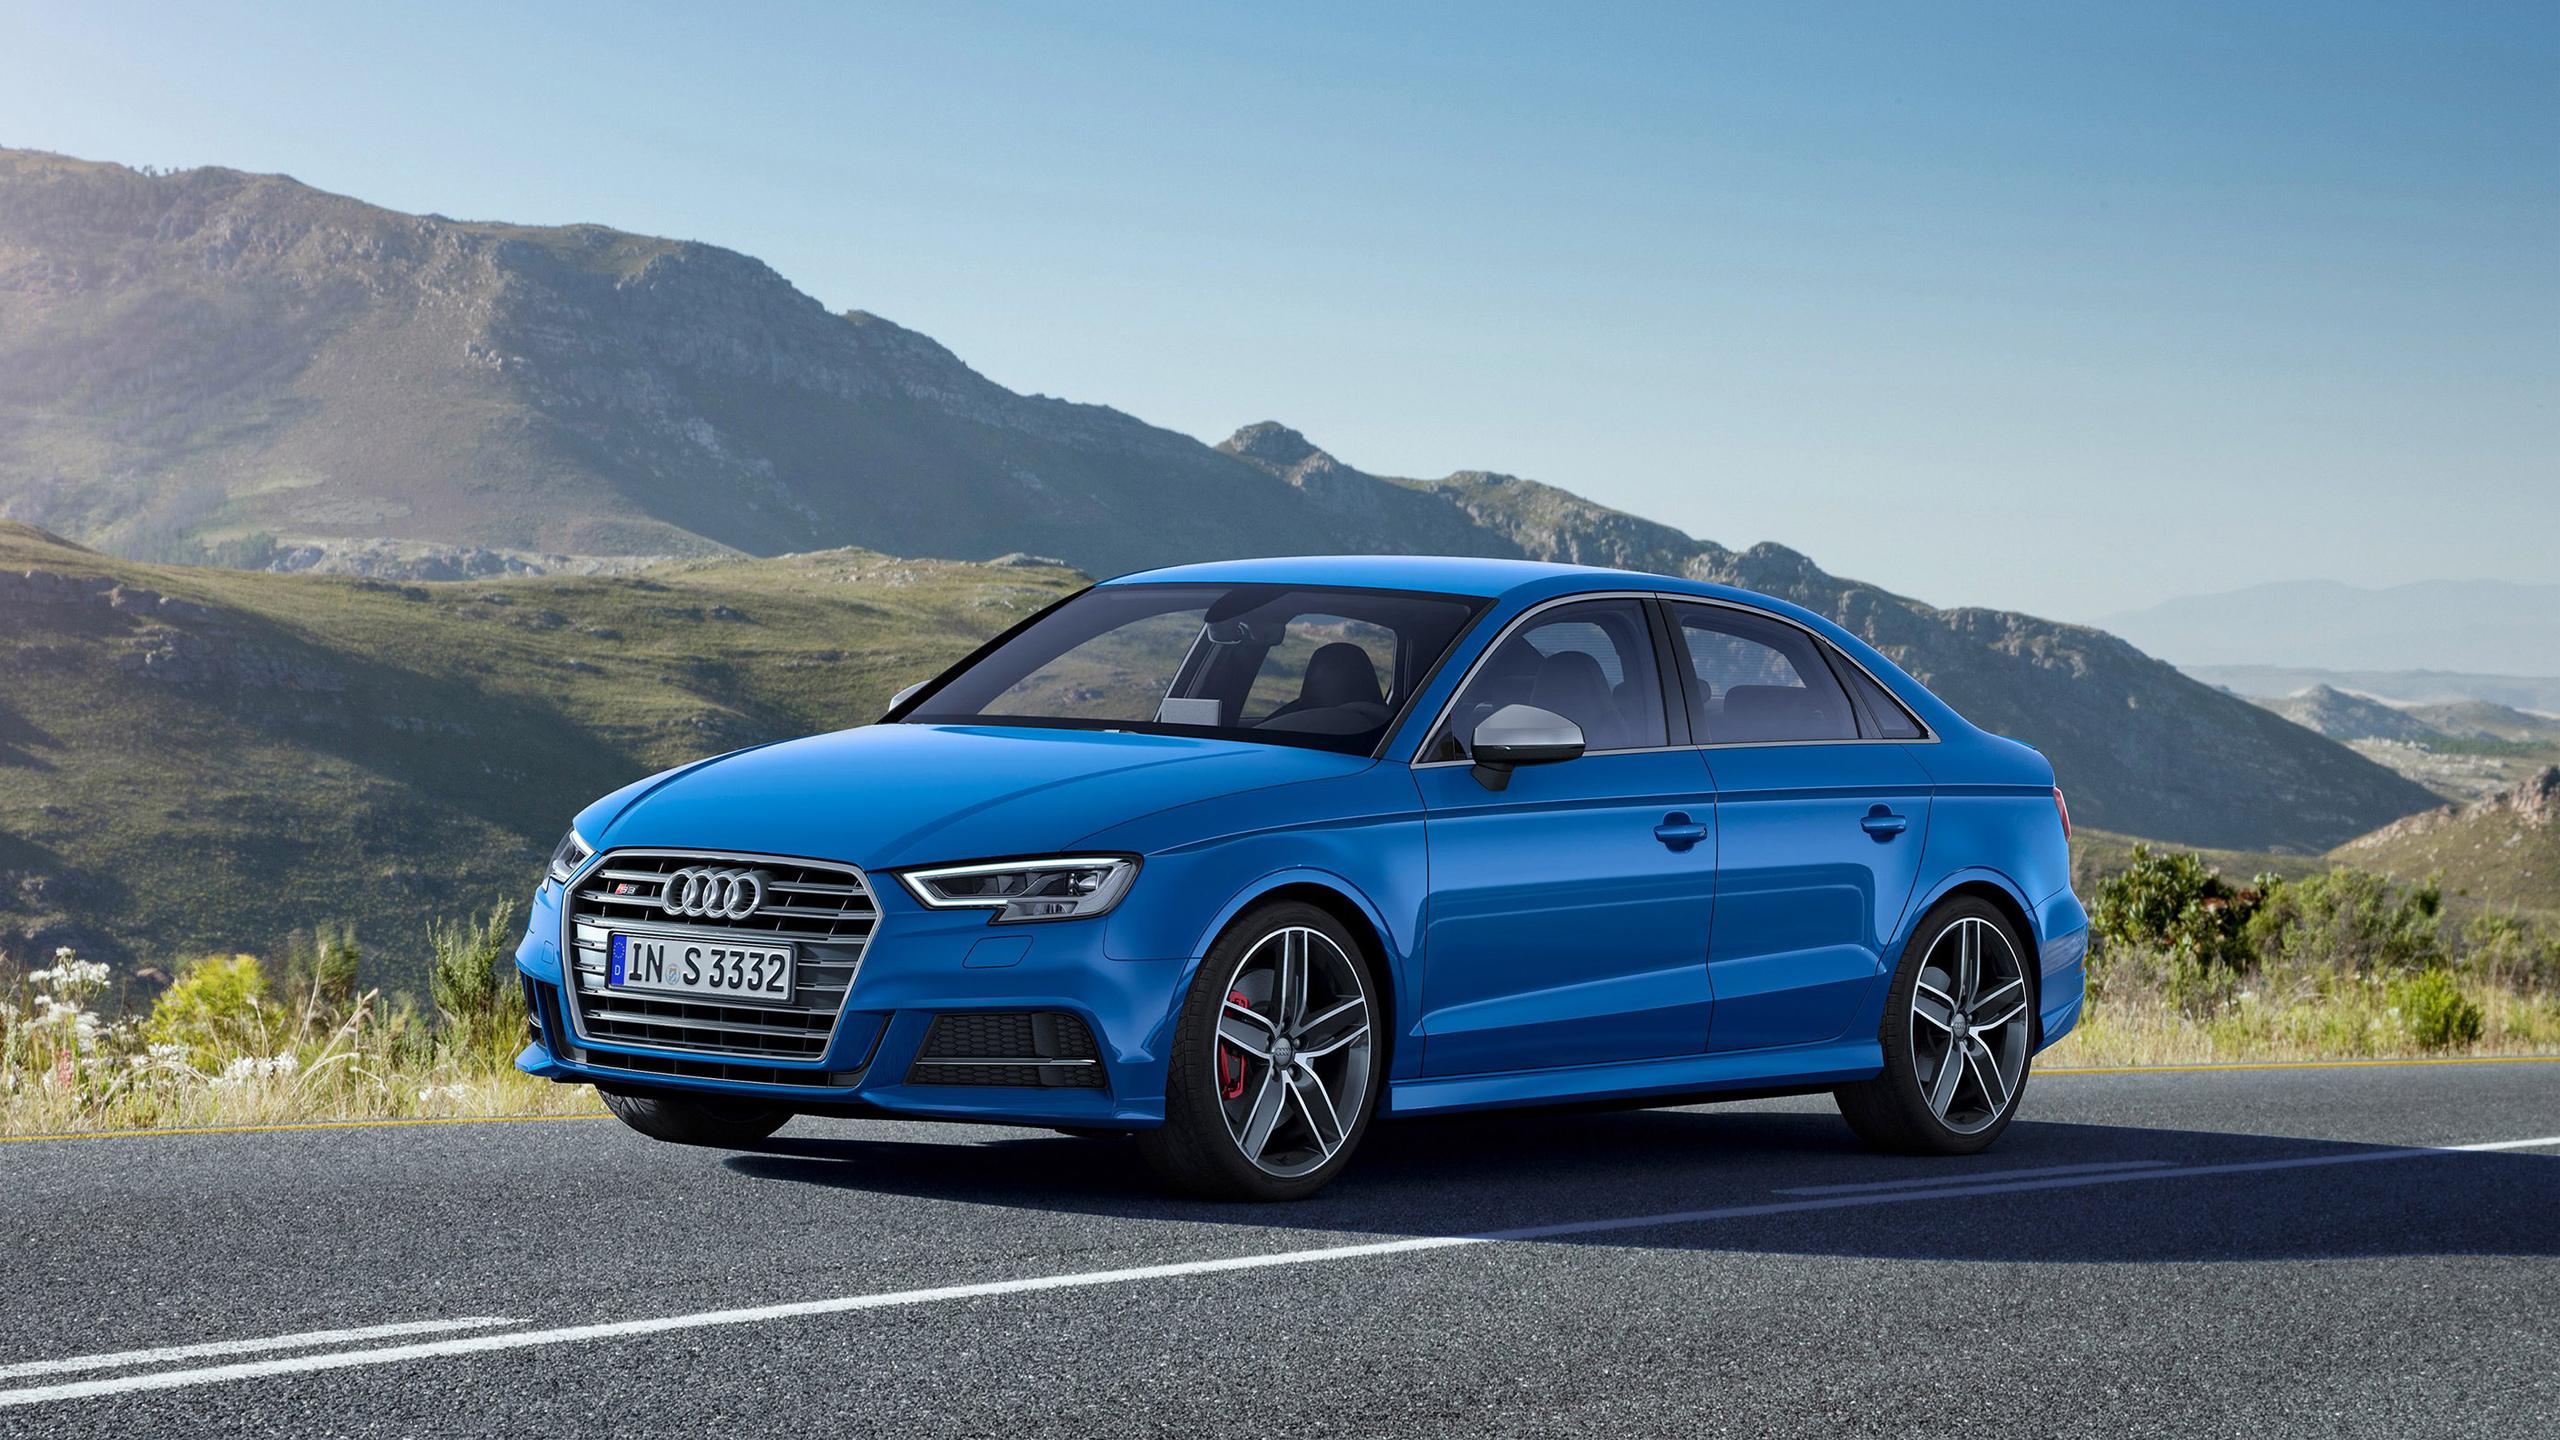 Audi R8 Hd Widescreen Wallpapers 1080p 2017 Audi S3 Sedan Wallpaper Hd Car Wallpapers Id 6865